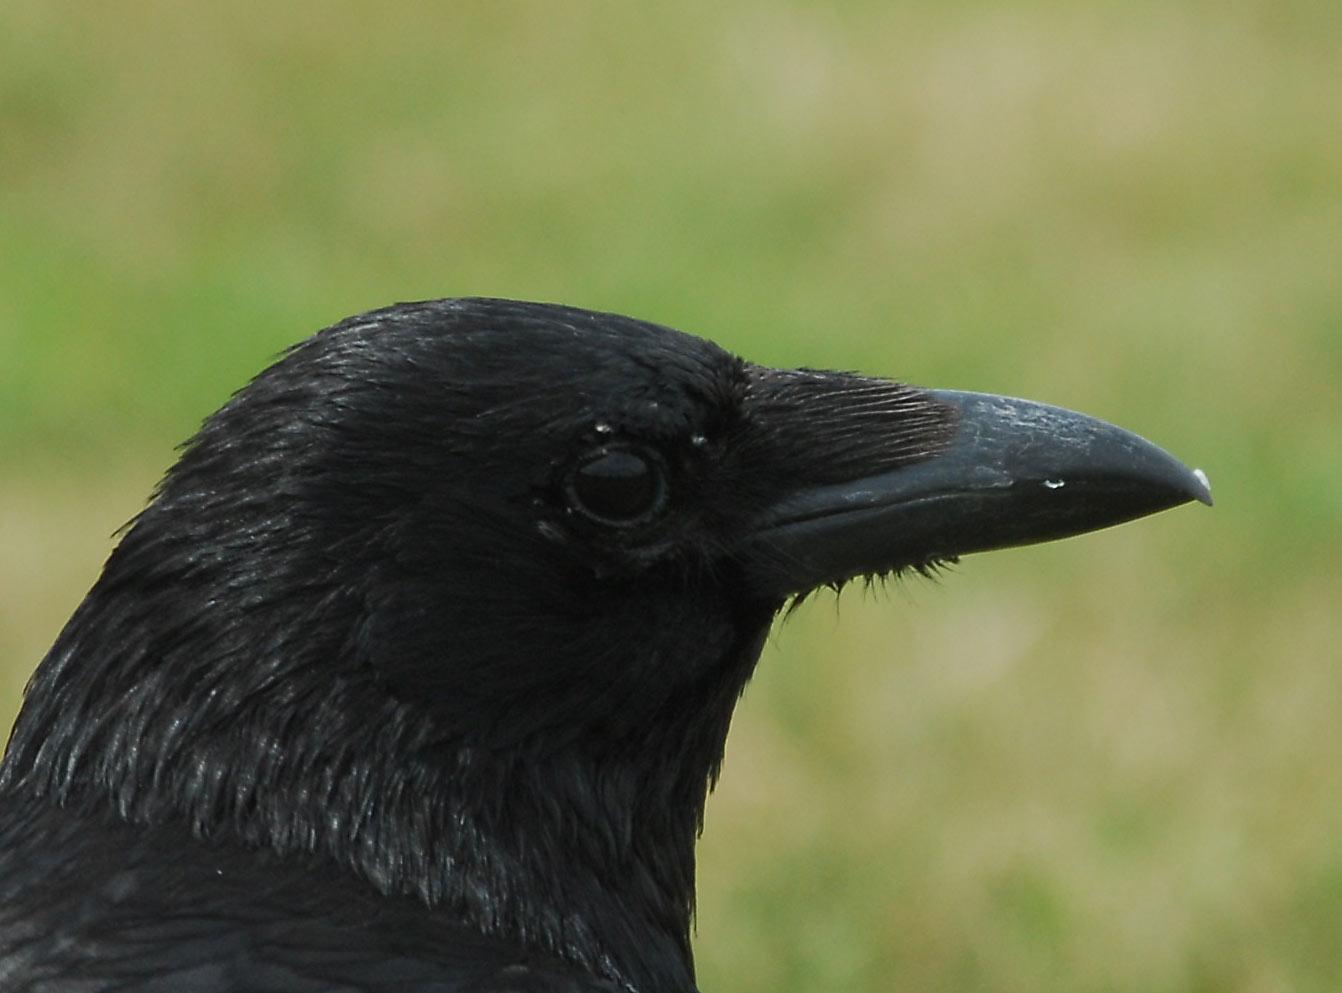 http://3.bp.blogspot.com/_d6MUaJRC1gk/TEIhlh-wHTI/AAAAAAAAB6Q/COTMOxvvWDE/s1600/crow1.jpg